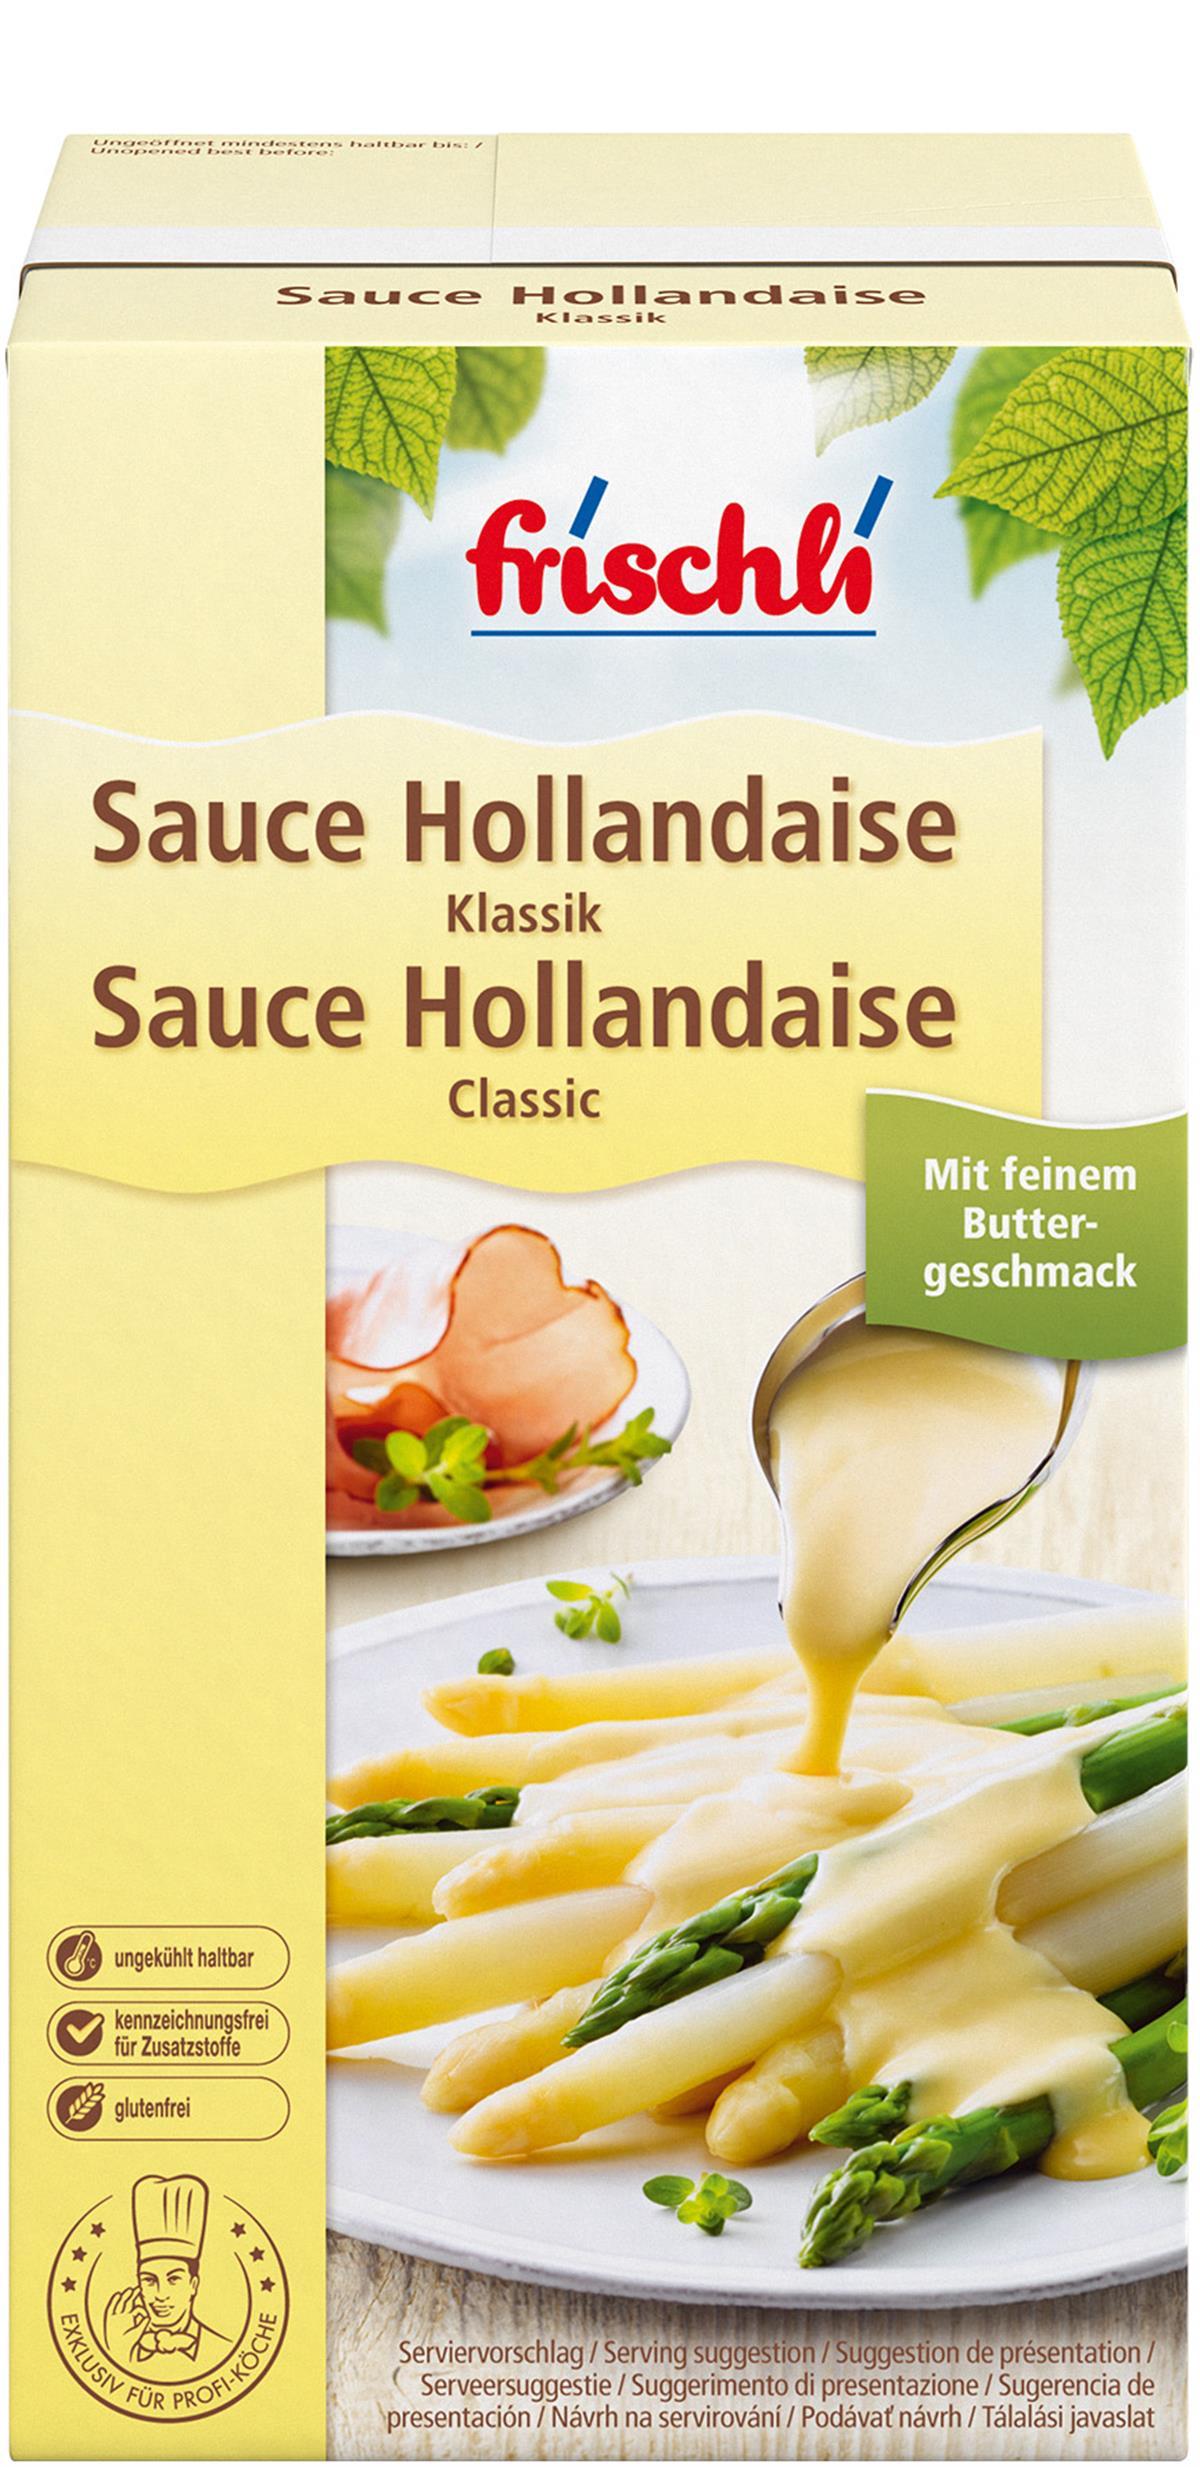 Sauce Hollandaise - Klassik Frischli